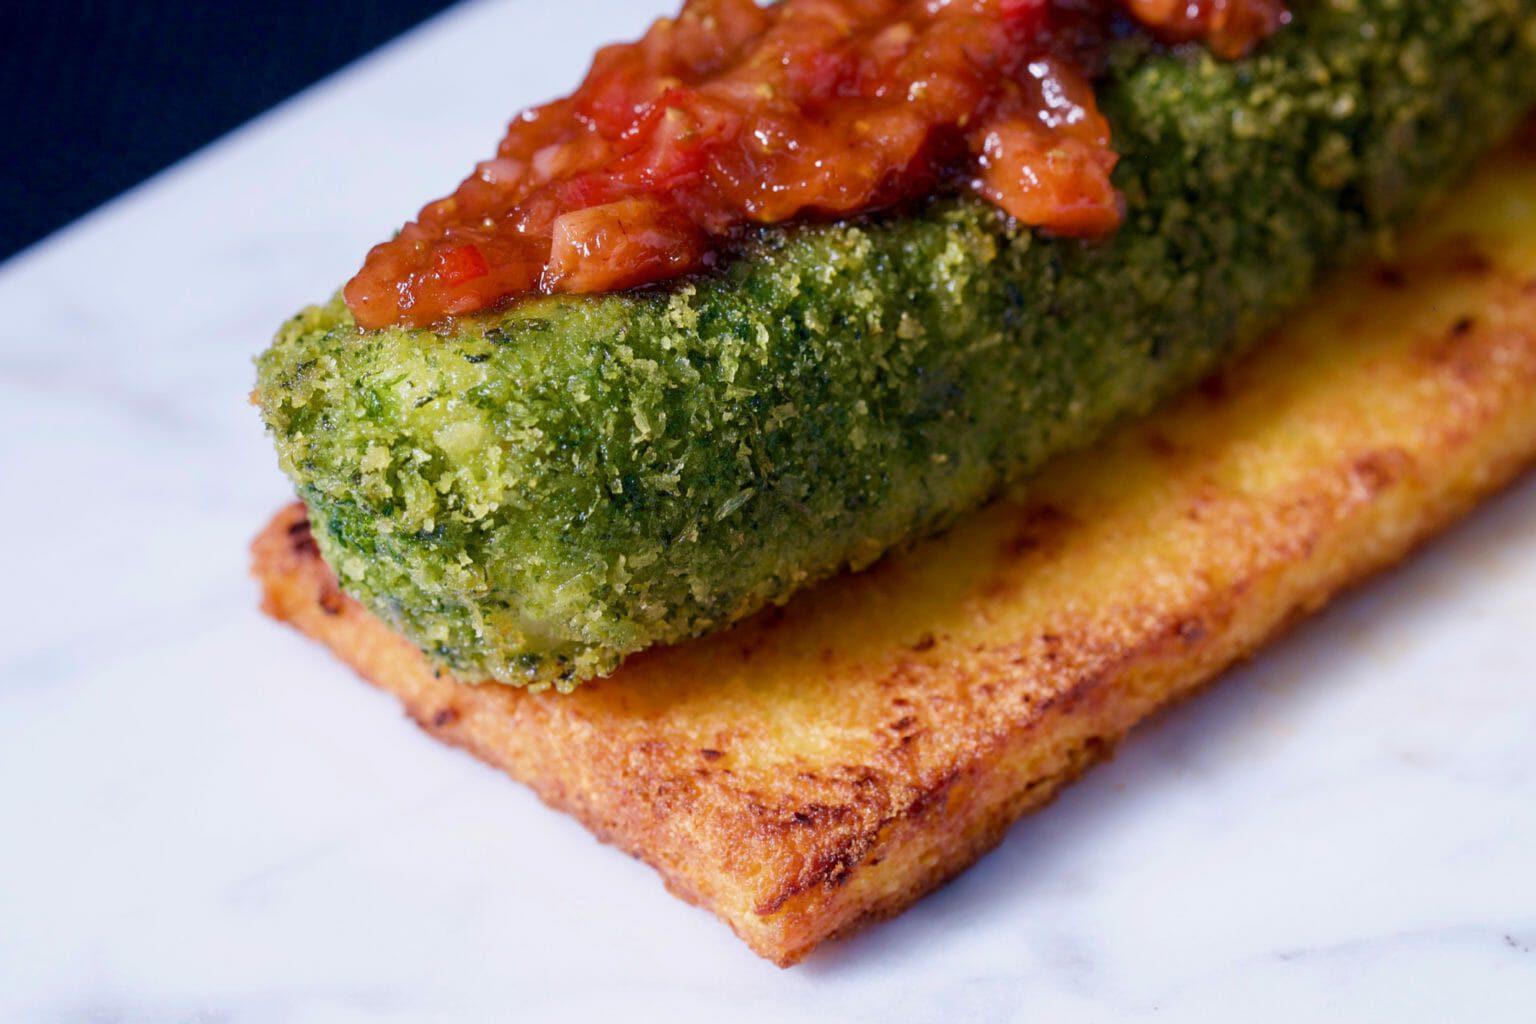 panko-crusted-cod-grilled-parmesan-polenta-strawberry-relish